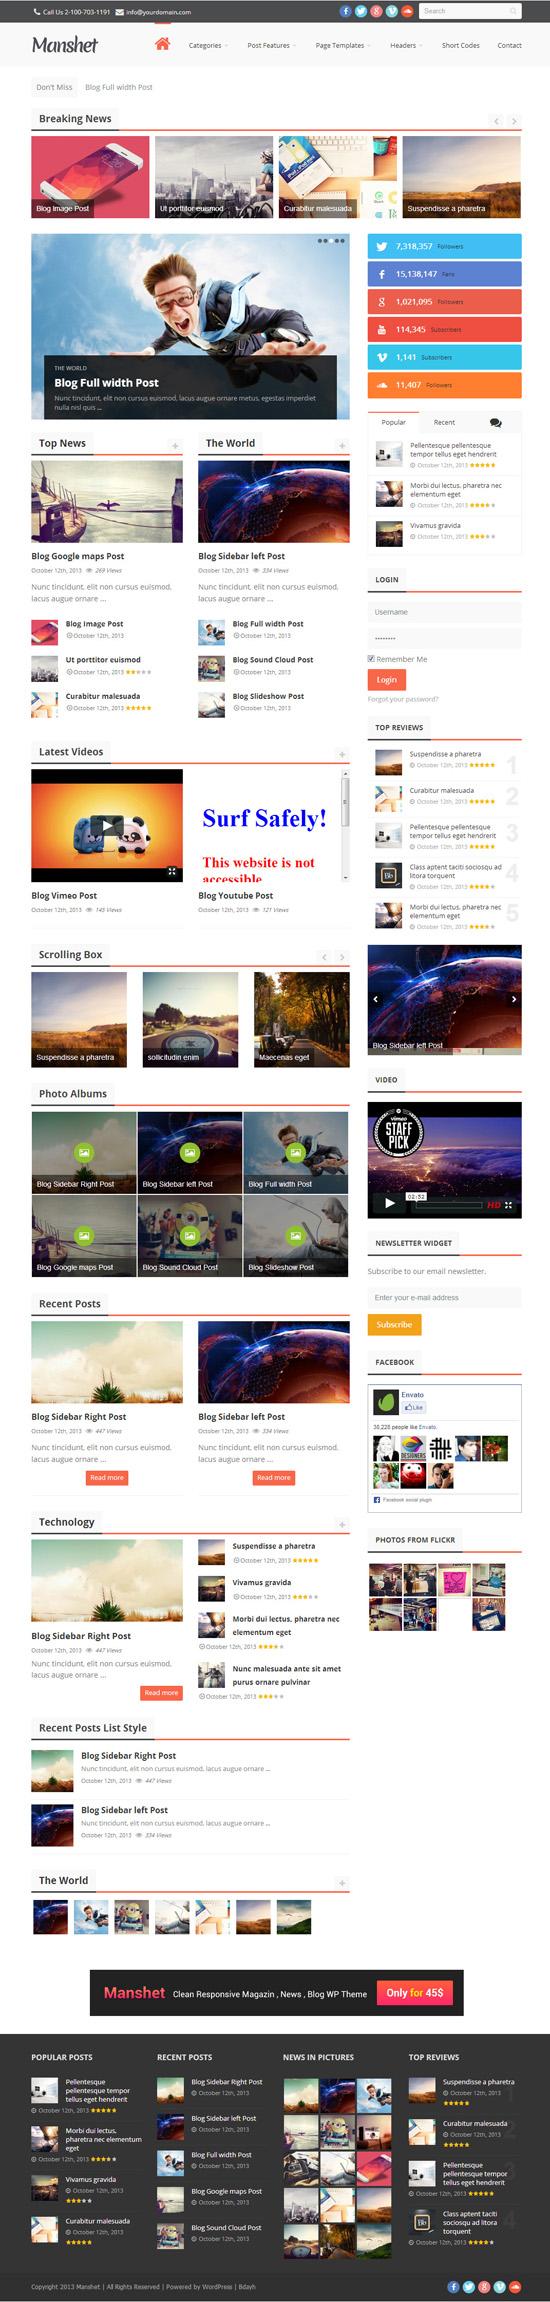 Manshet - Retina Responsive WordPress News, Magazine Theme